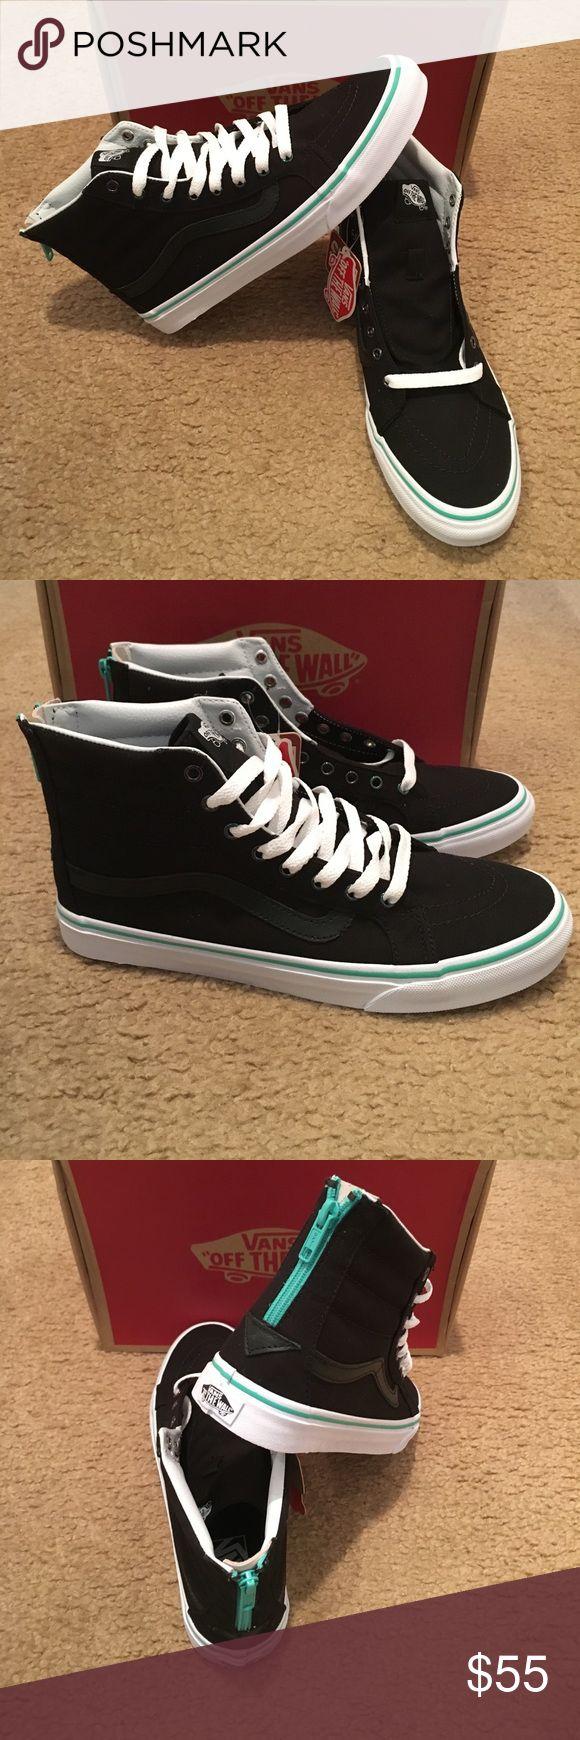 Iridescent Eyelets SK8Hi Slim Zip Vans VN000XH8IES New in box. Black Vans Shoes Sneakers